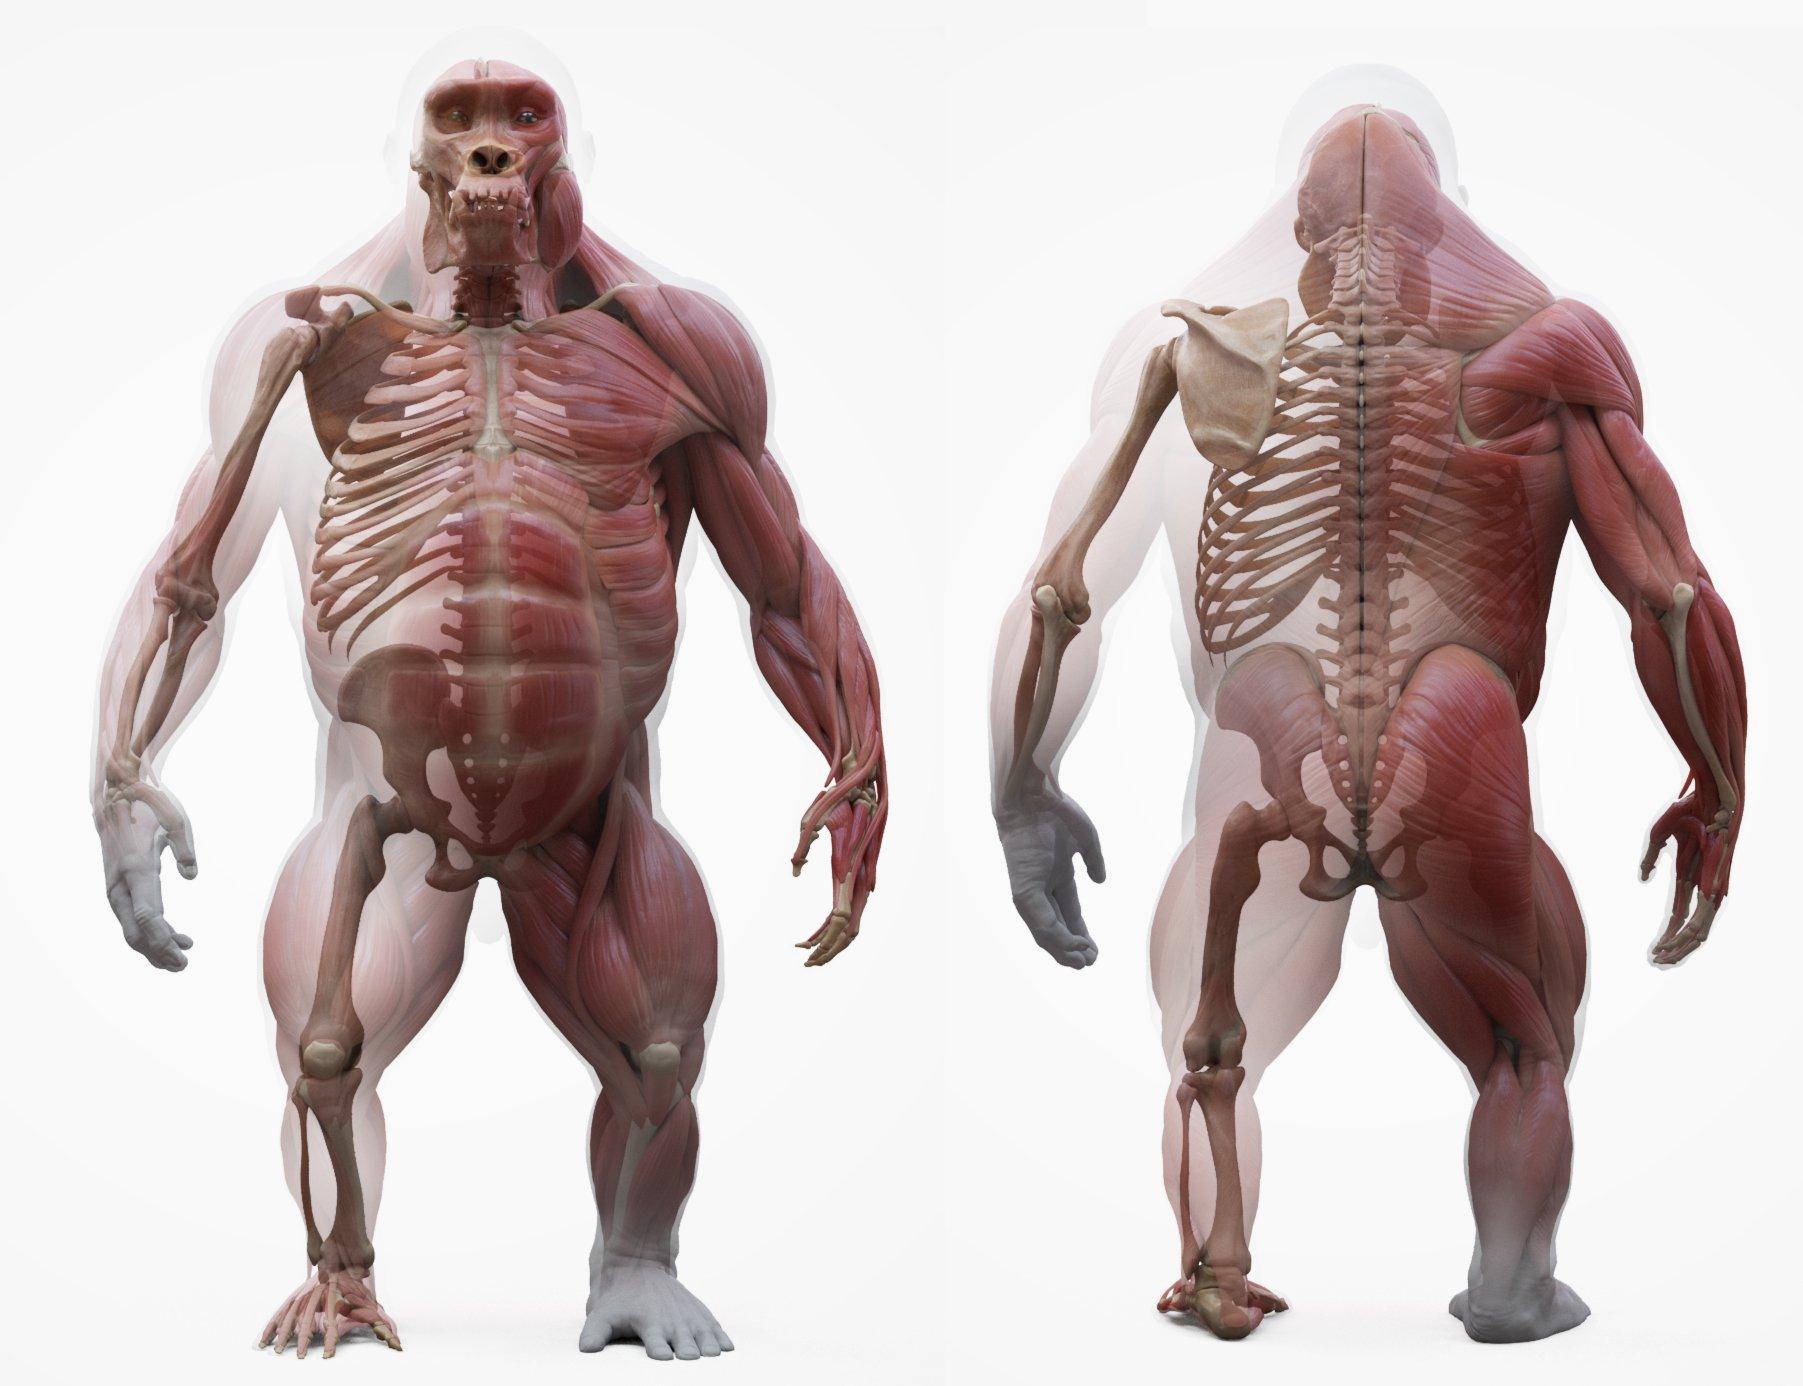 Gorilla 3D Model Download